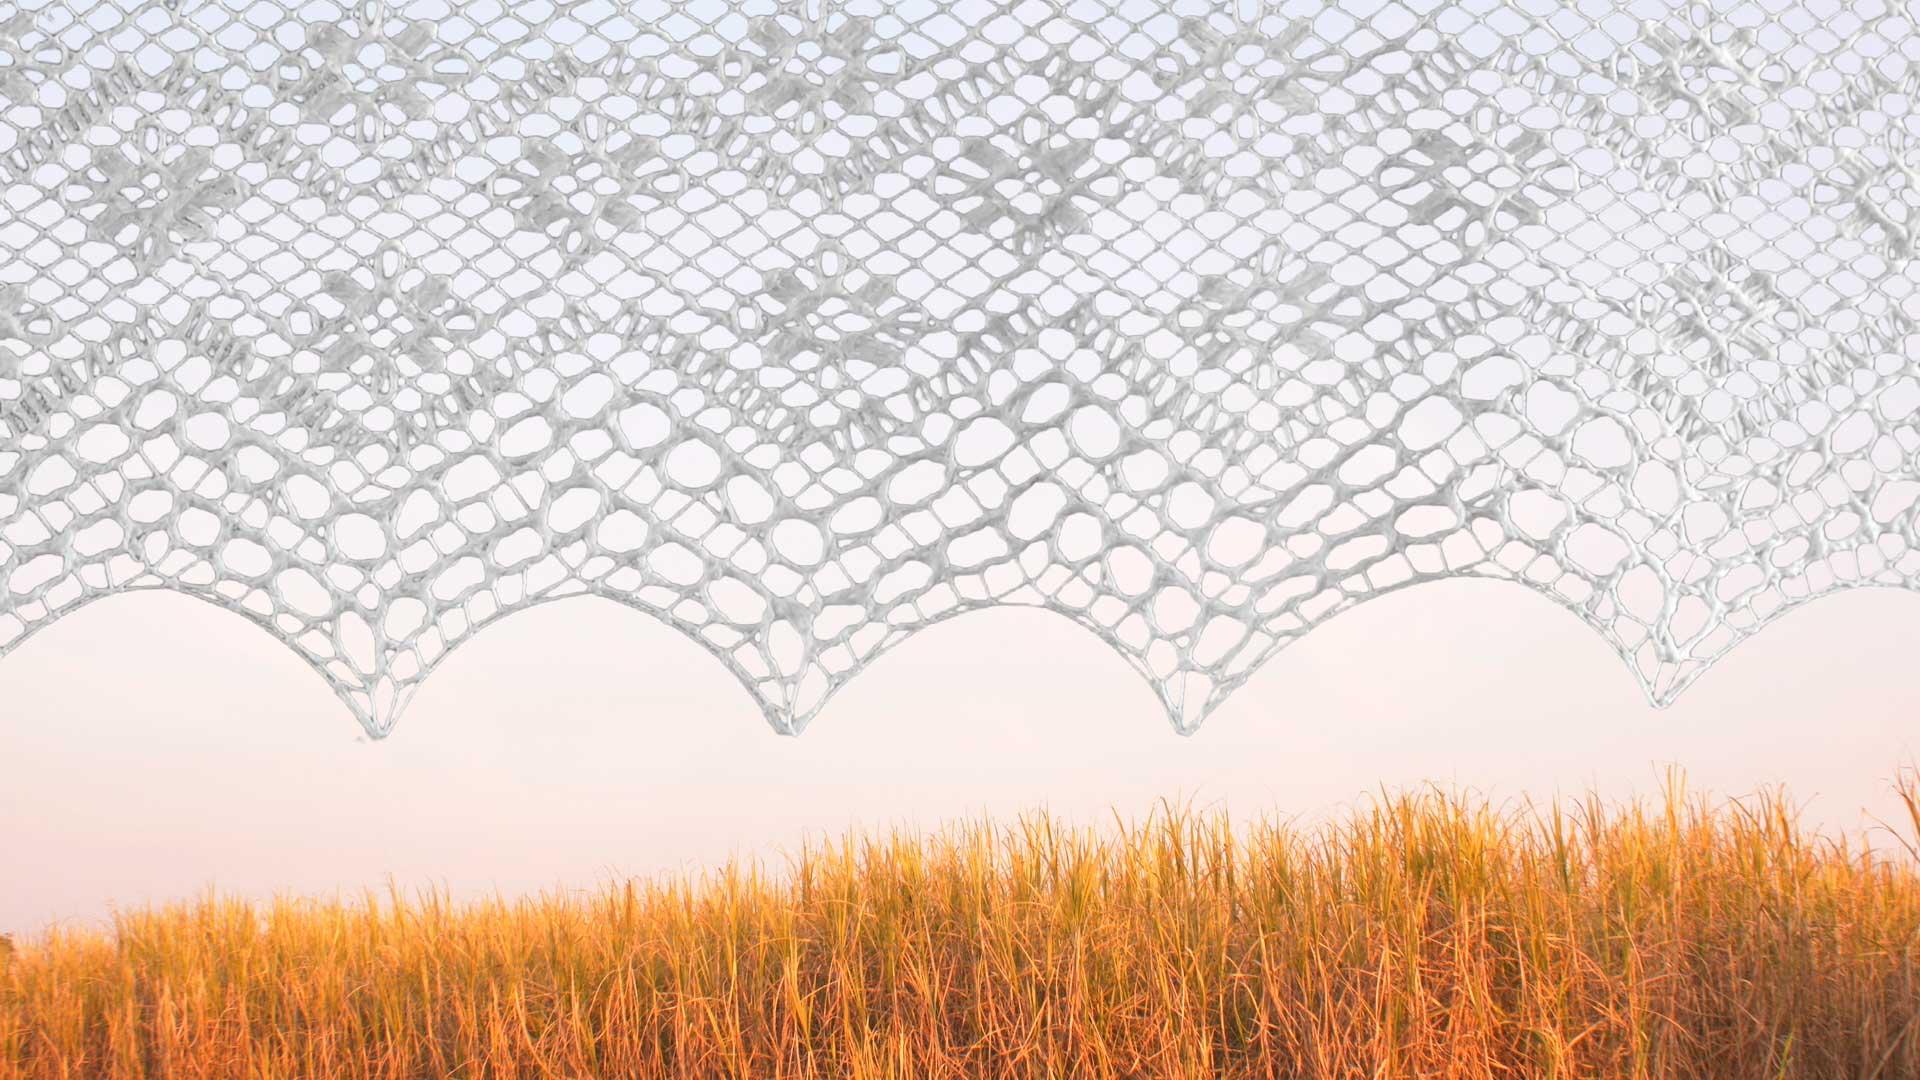 Textil sobre paisaje de cañaveral